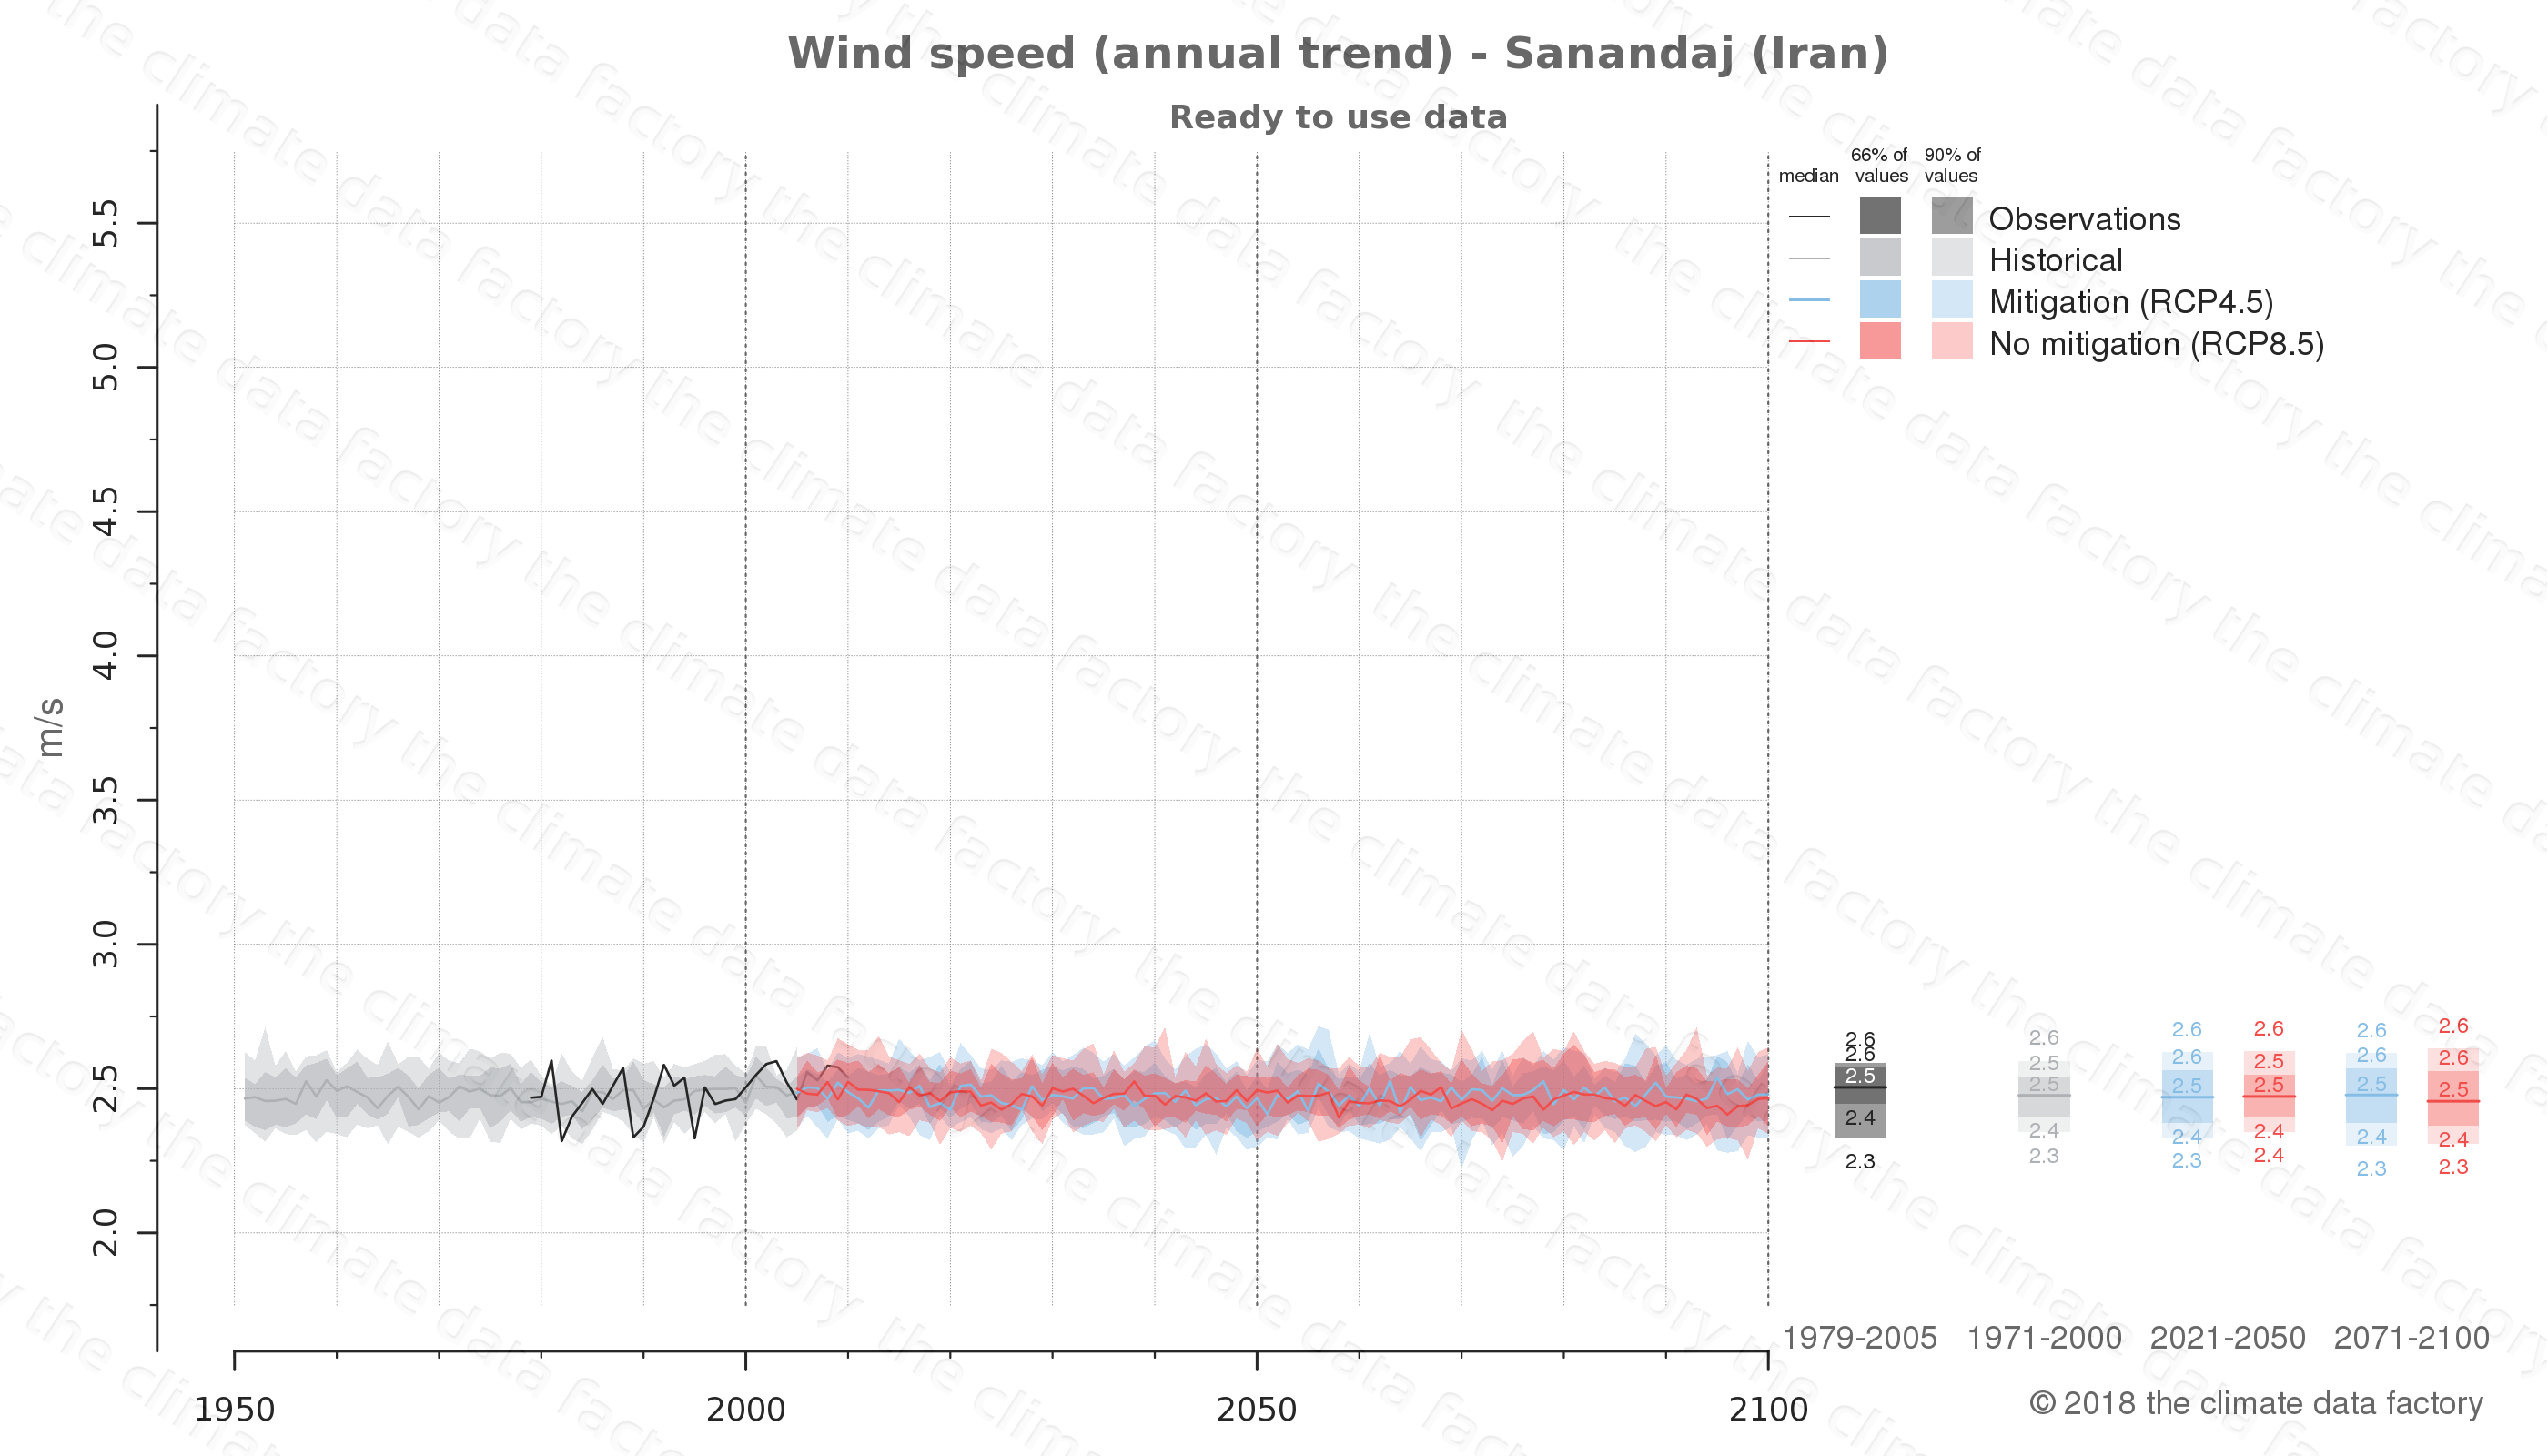 climate change data policy adaptation climate graph city data wind-speed sanandaj iran